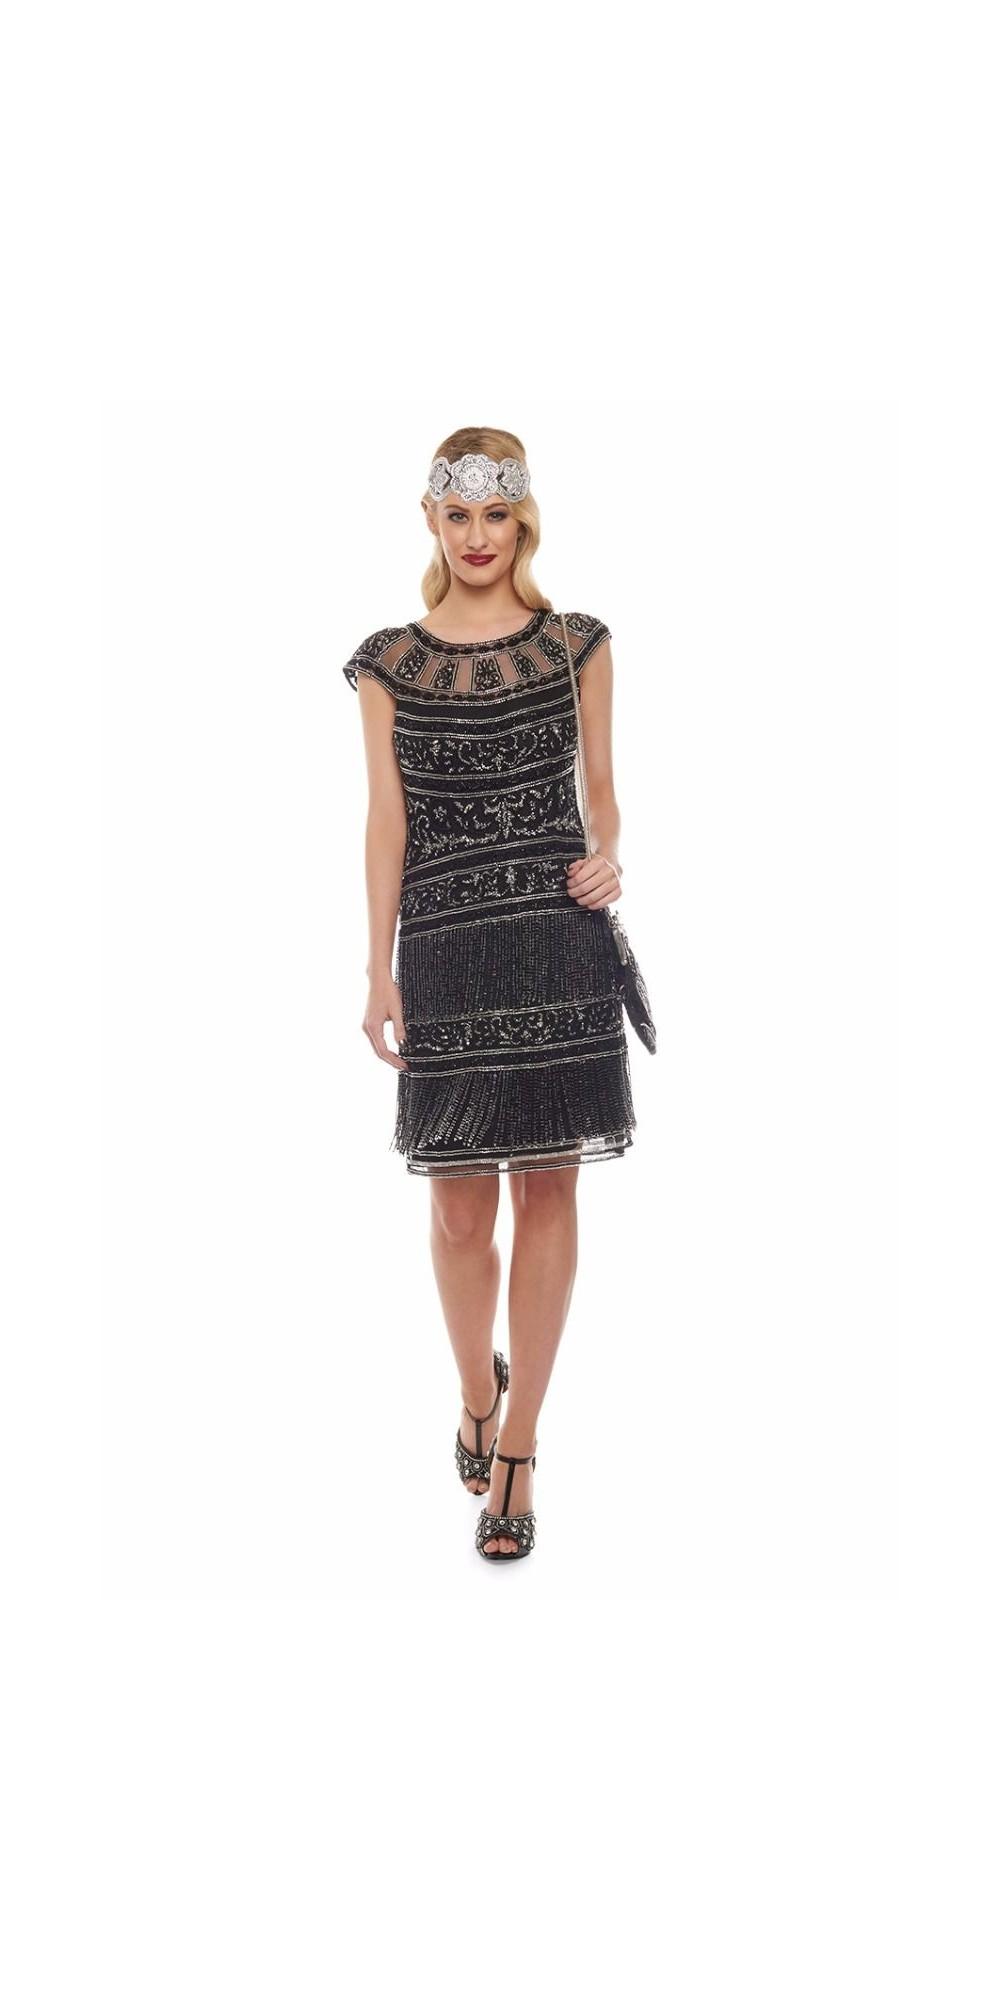 roaring twenties fringe party dress in black silver